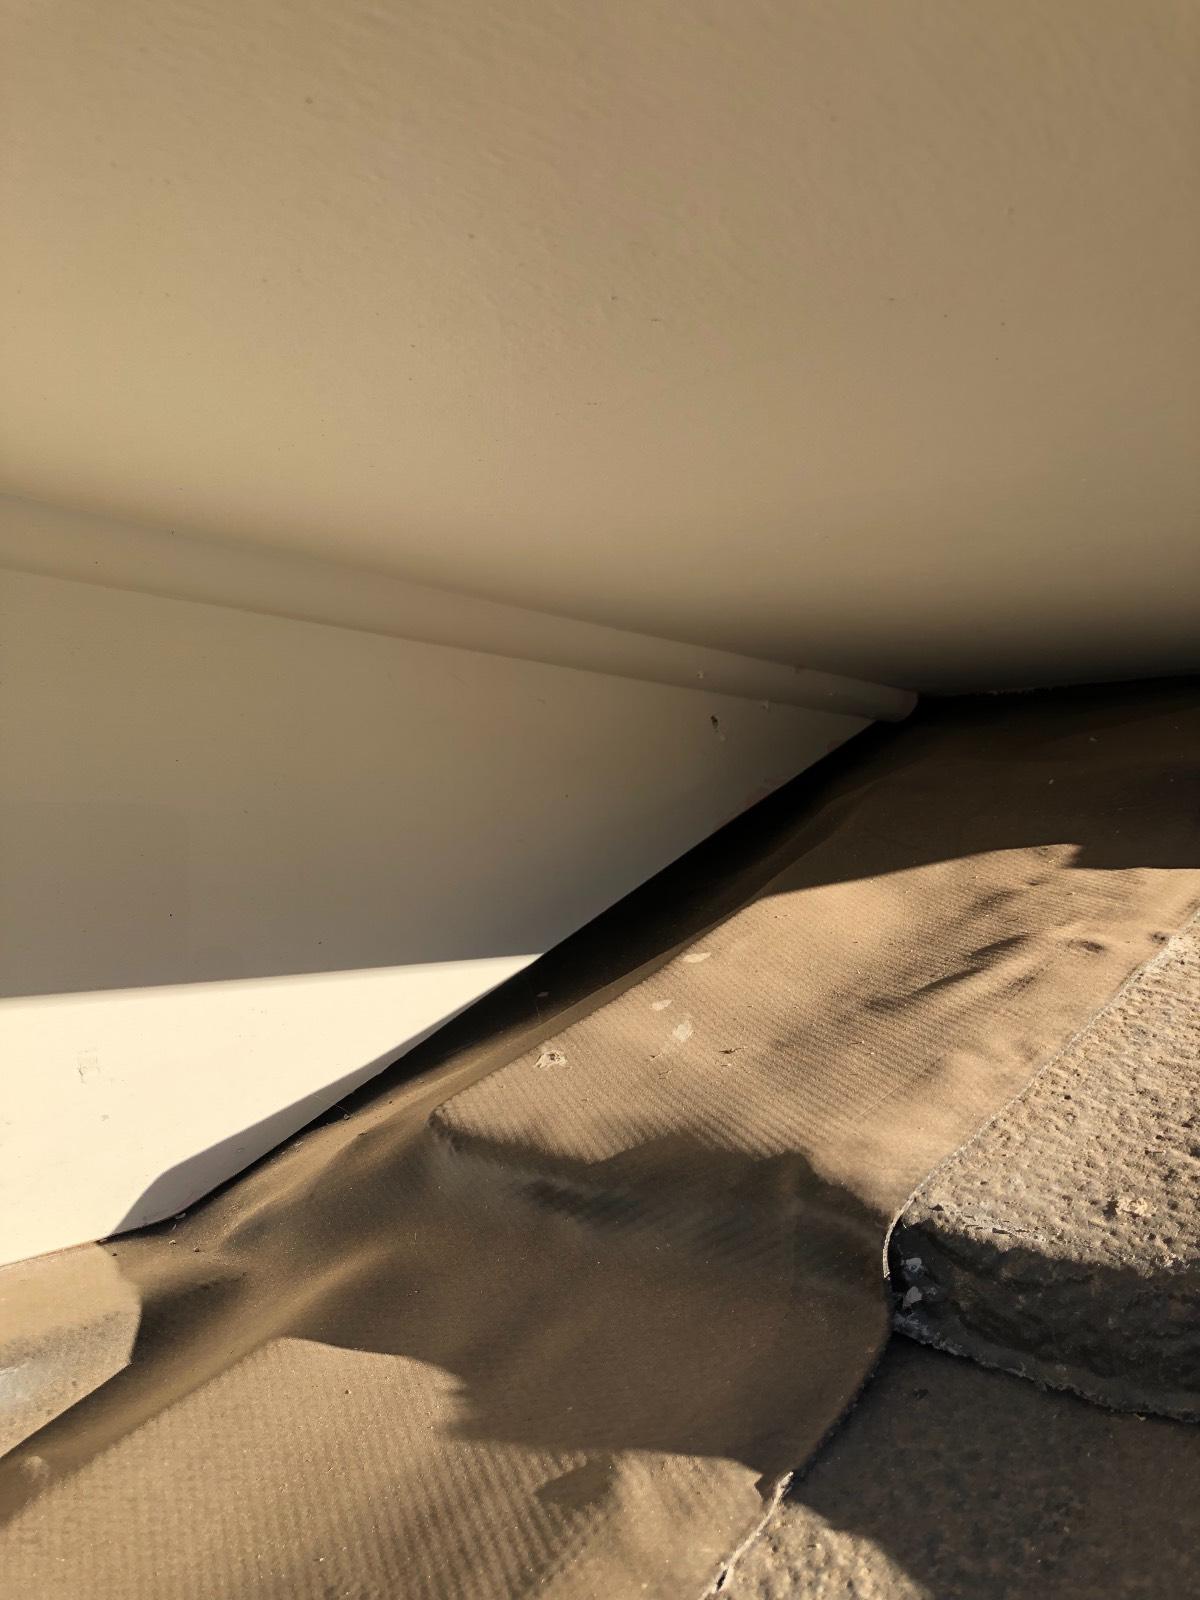 Gap between eves/fascia and roof tiles